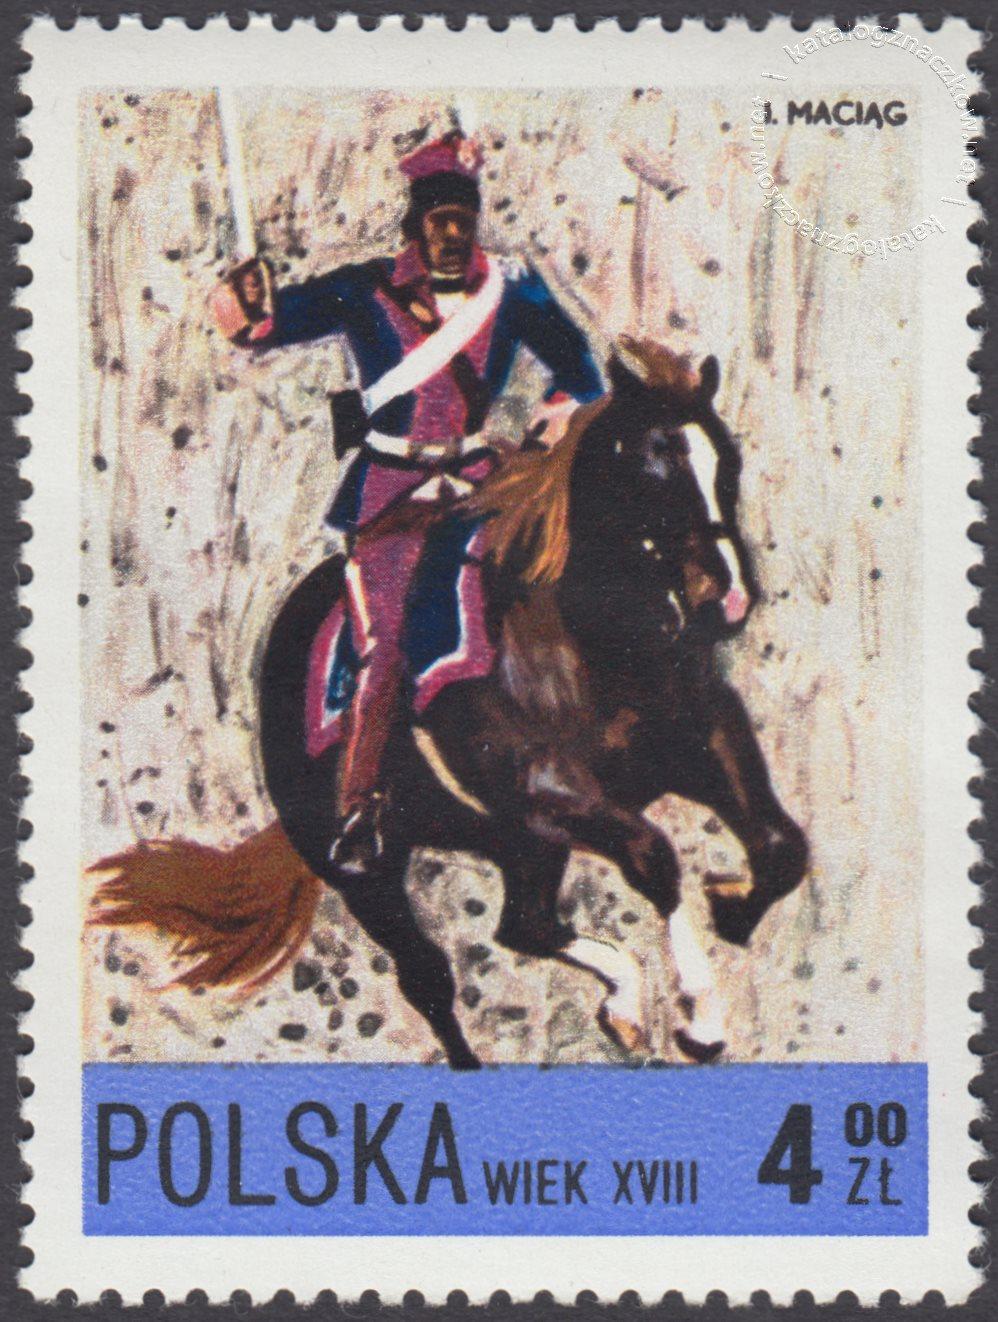 Jazda polska X-XXw. znaczek nr 2079